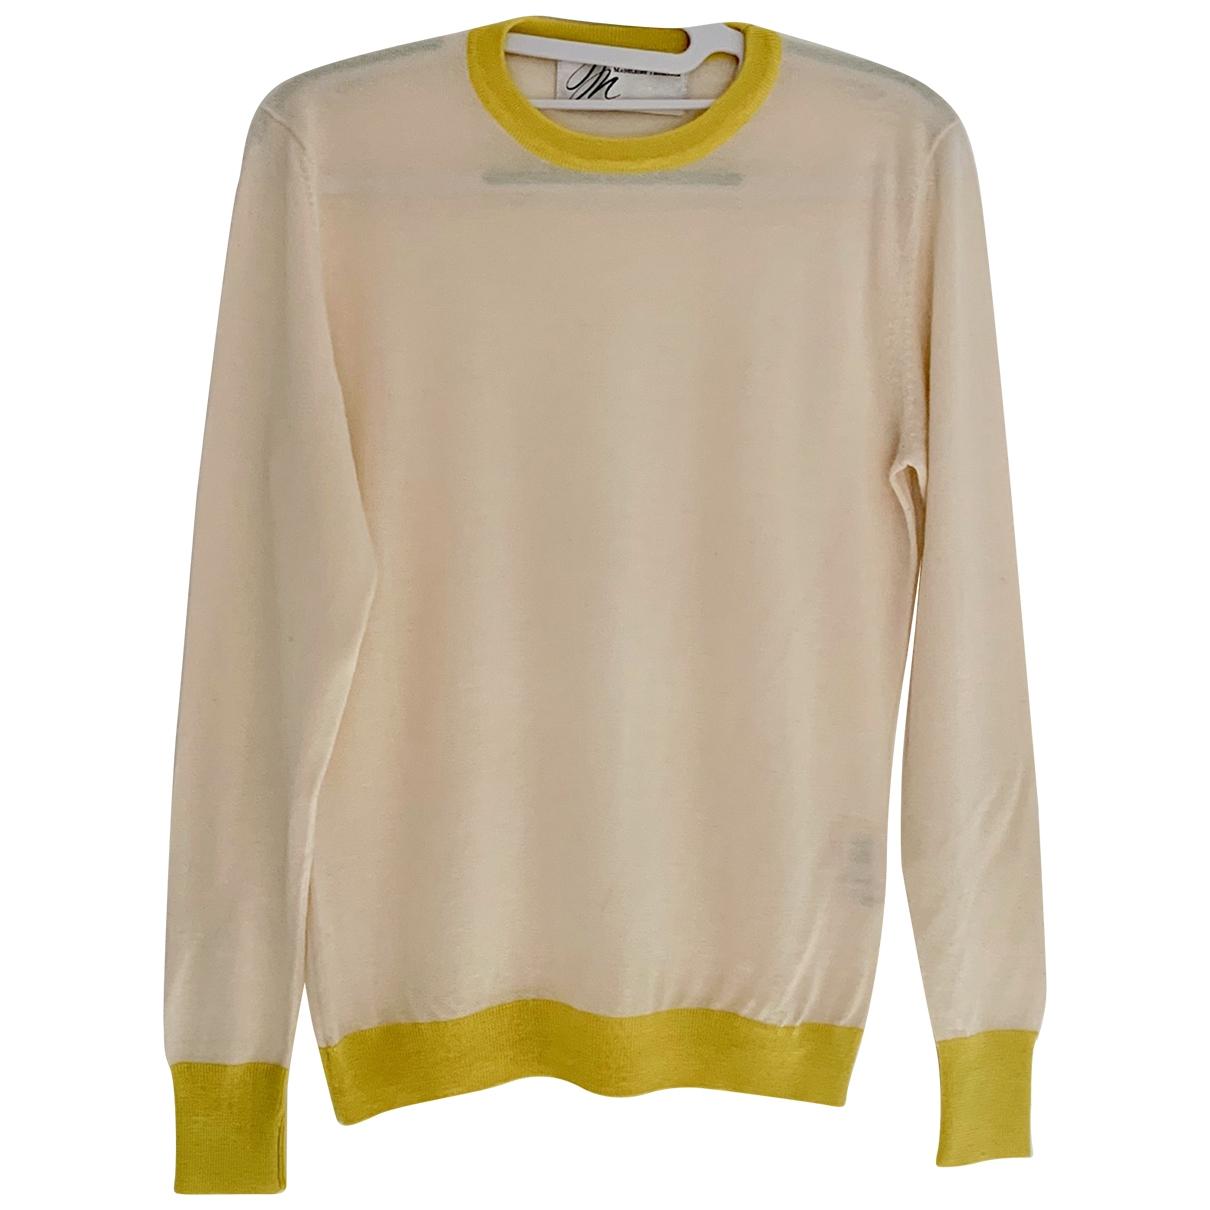 Madeleine Thompson \N Cashmere Knitwear for Women M International